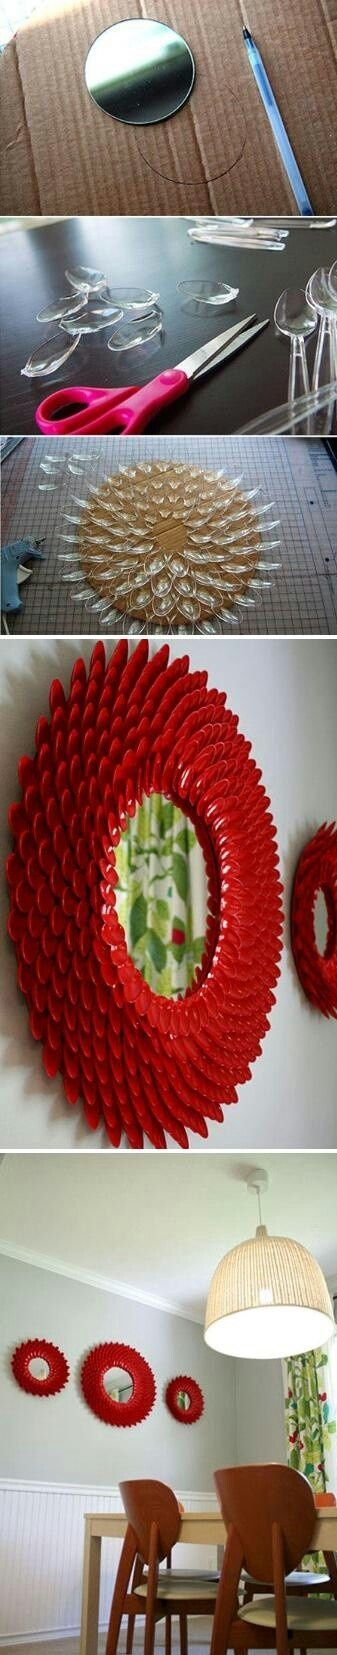 .plastic spoon mirror